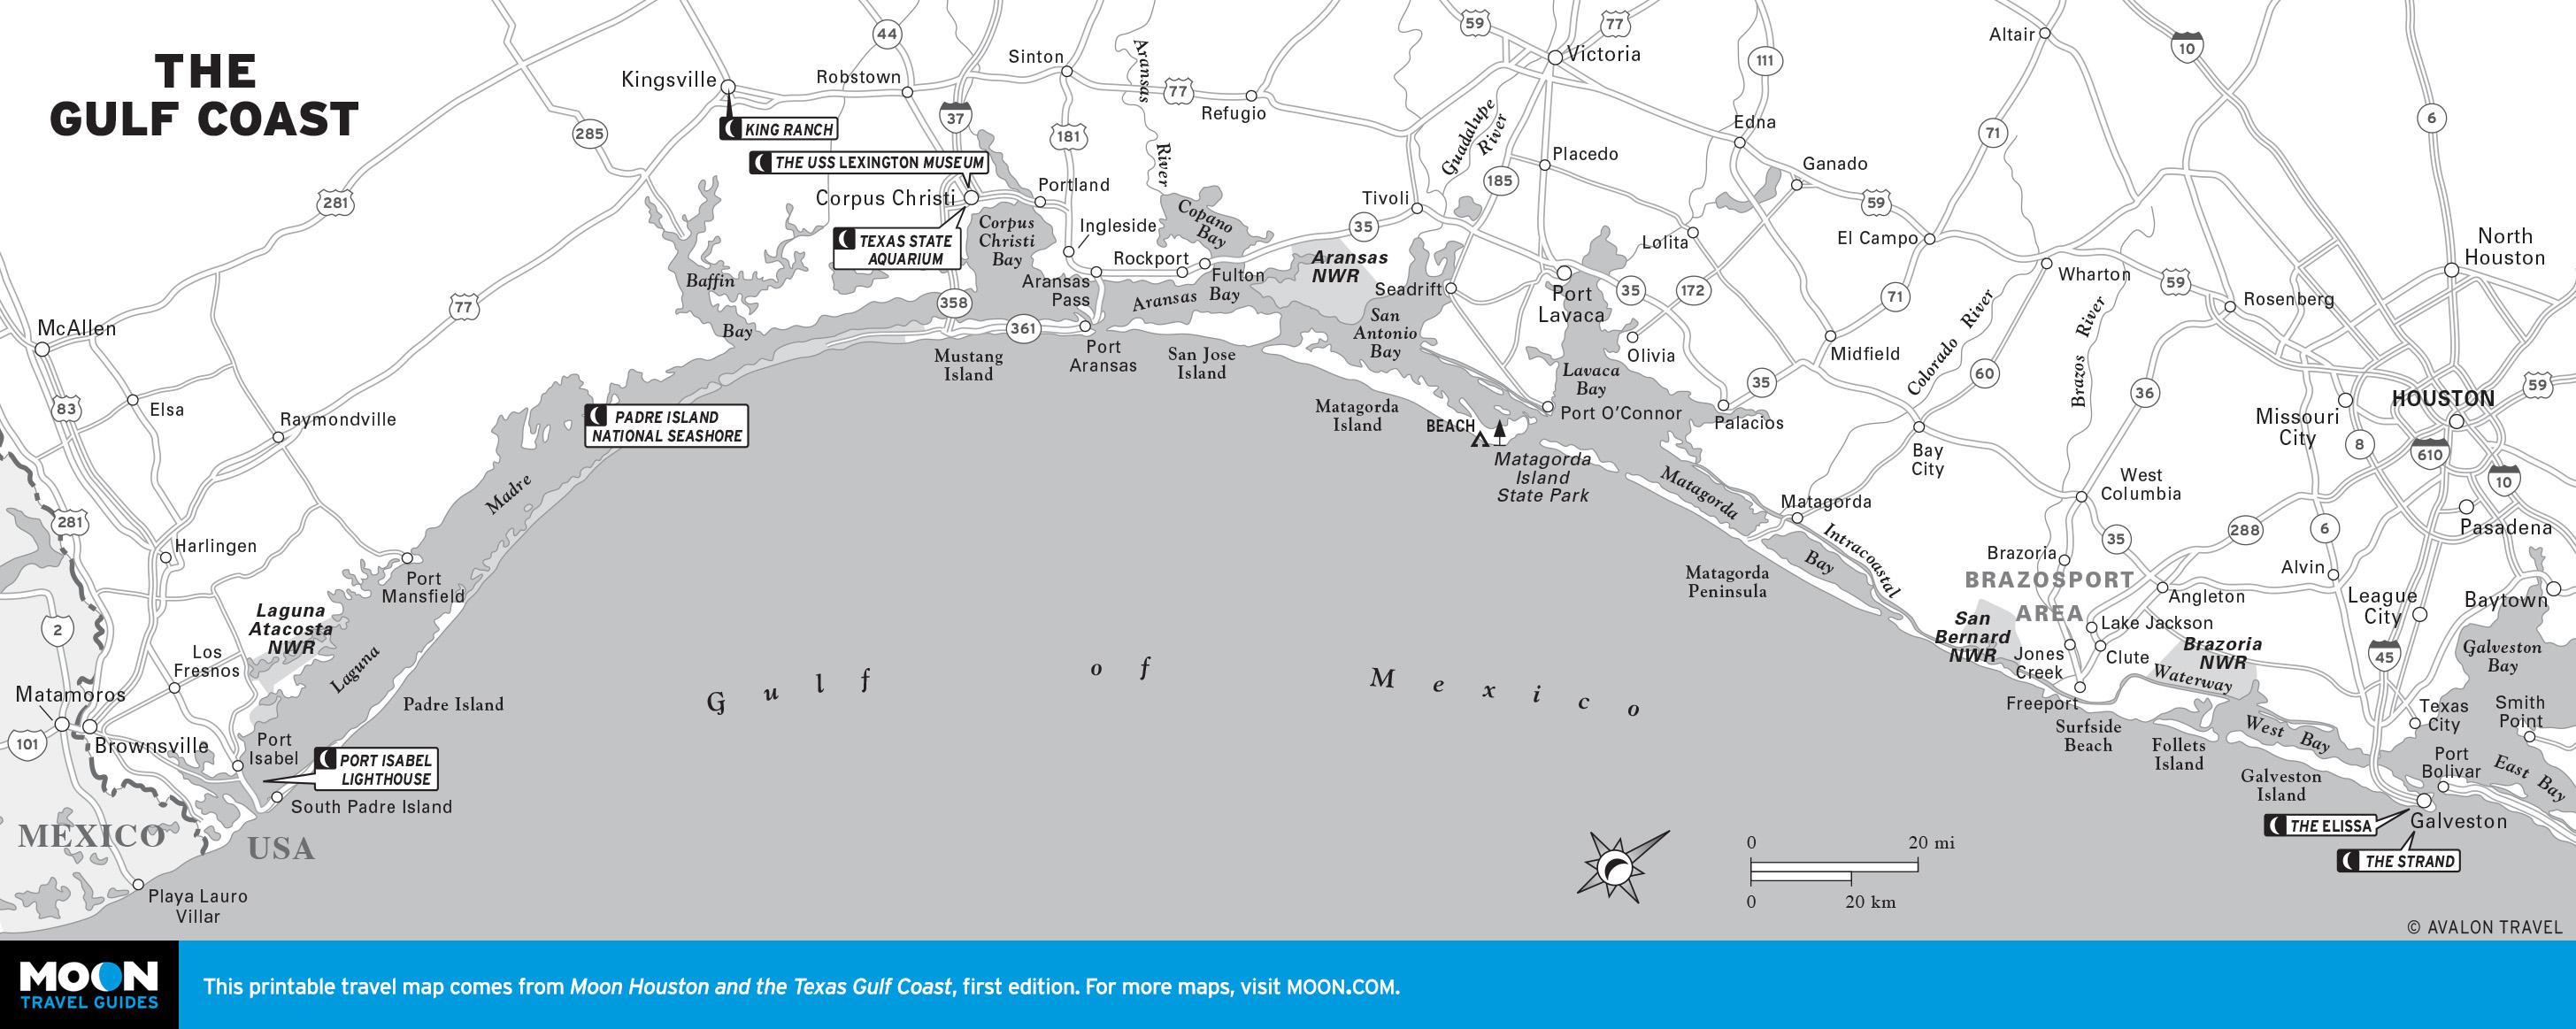 Map Of Texas Gulf Coast Beaches | Business Ideas 2013 - Texas Gulf Coast Beaches Map